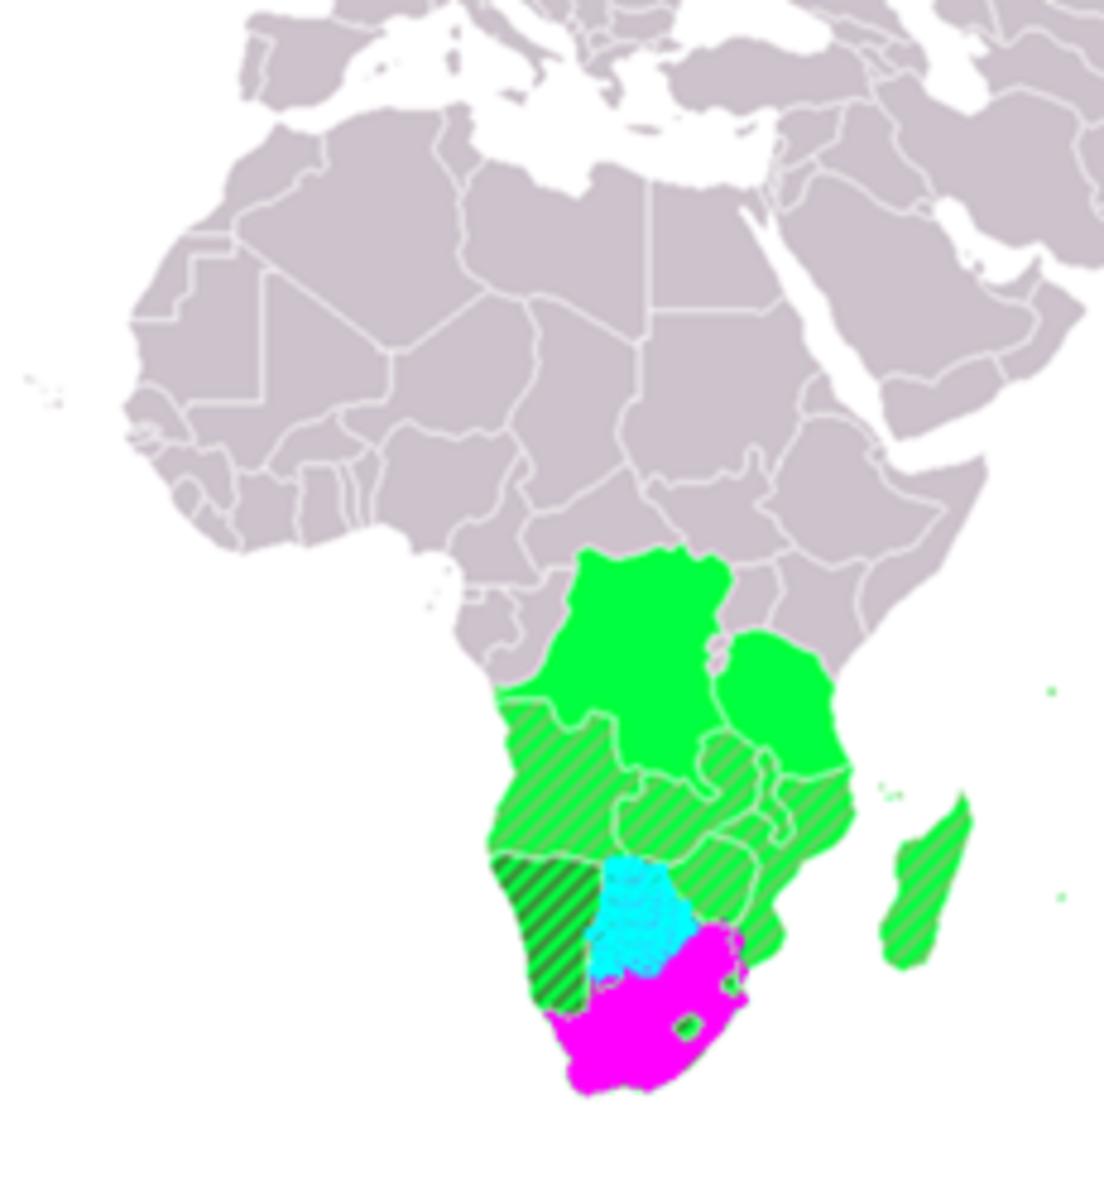 Pink - South Africa / Blue - Botswana